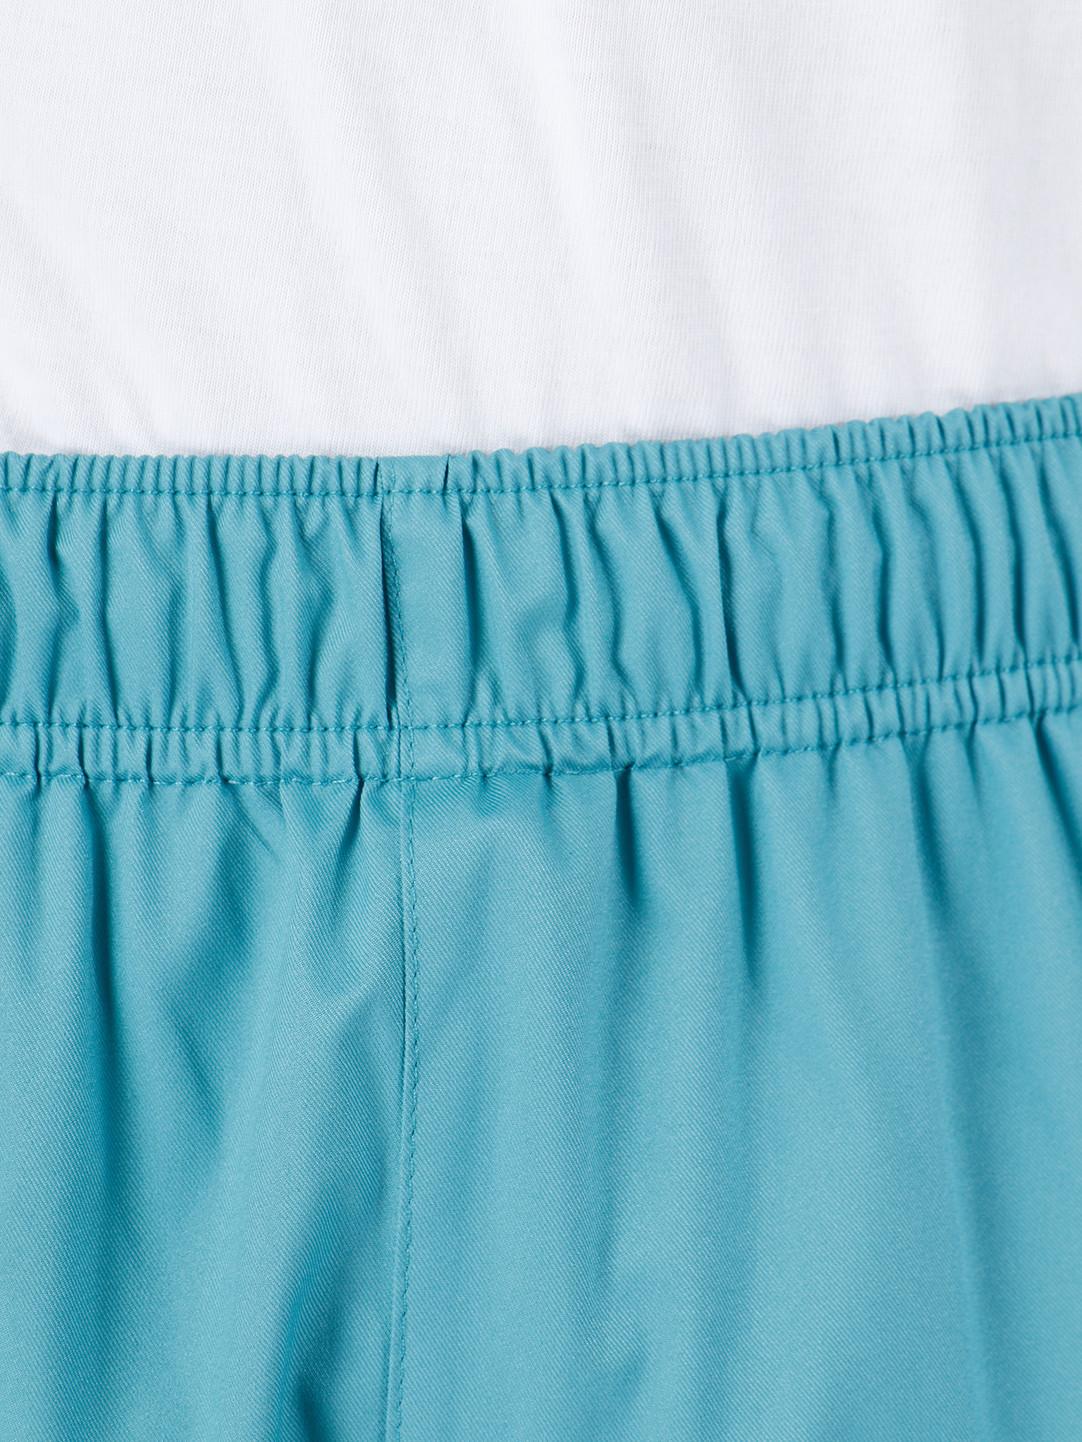 Stussy Stussy Alpine Pant Pant Mint 0406